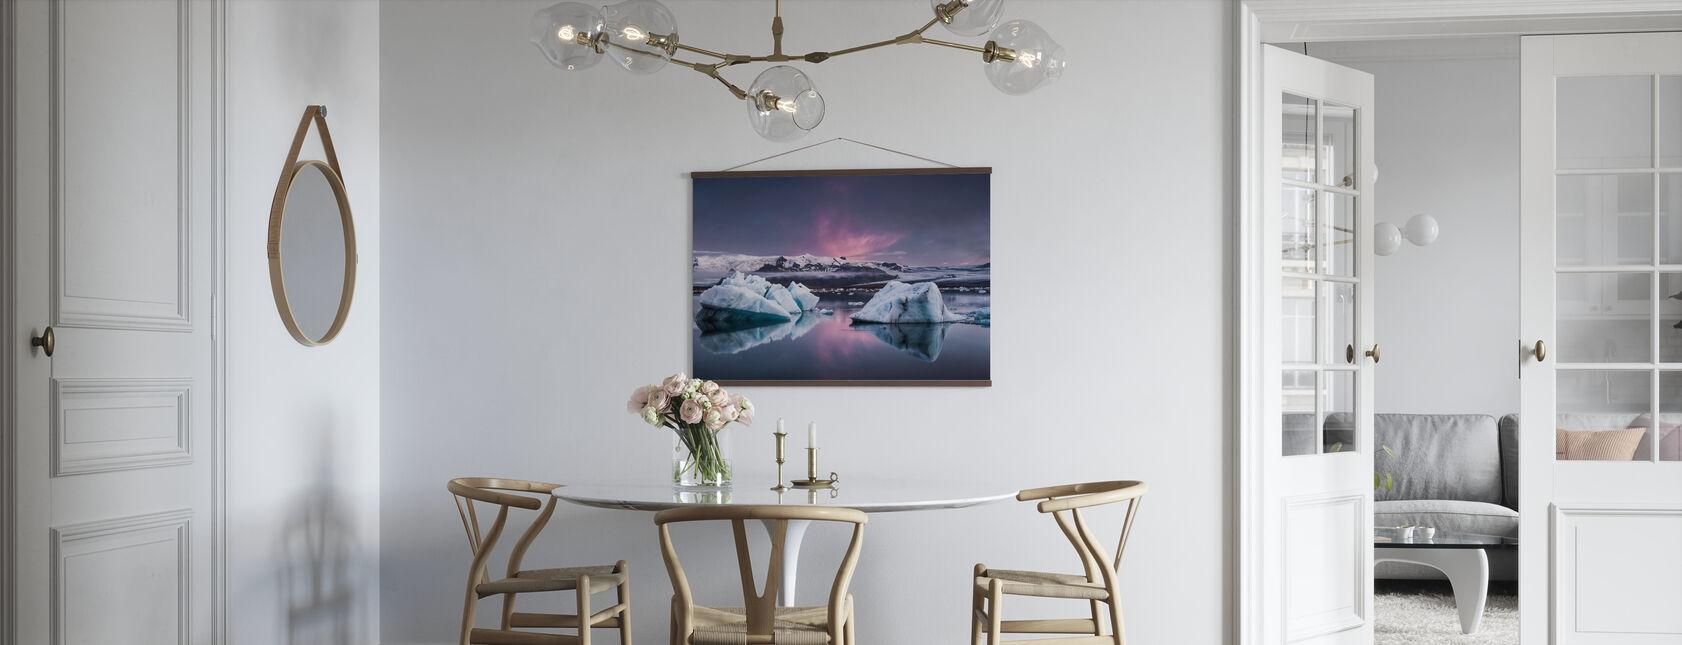 The Glacier Lagoon - Poster - Kitchen